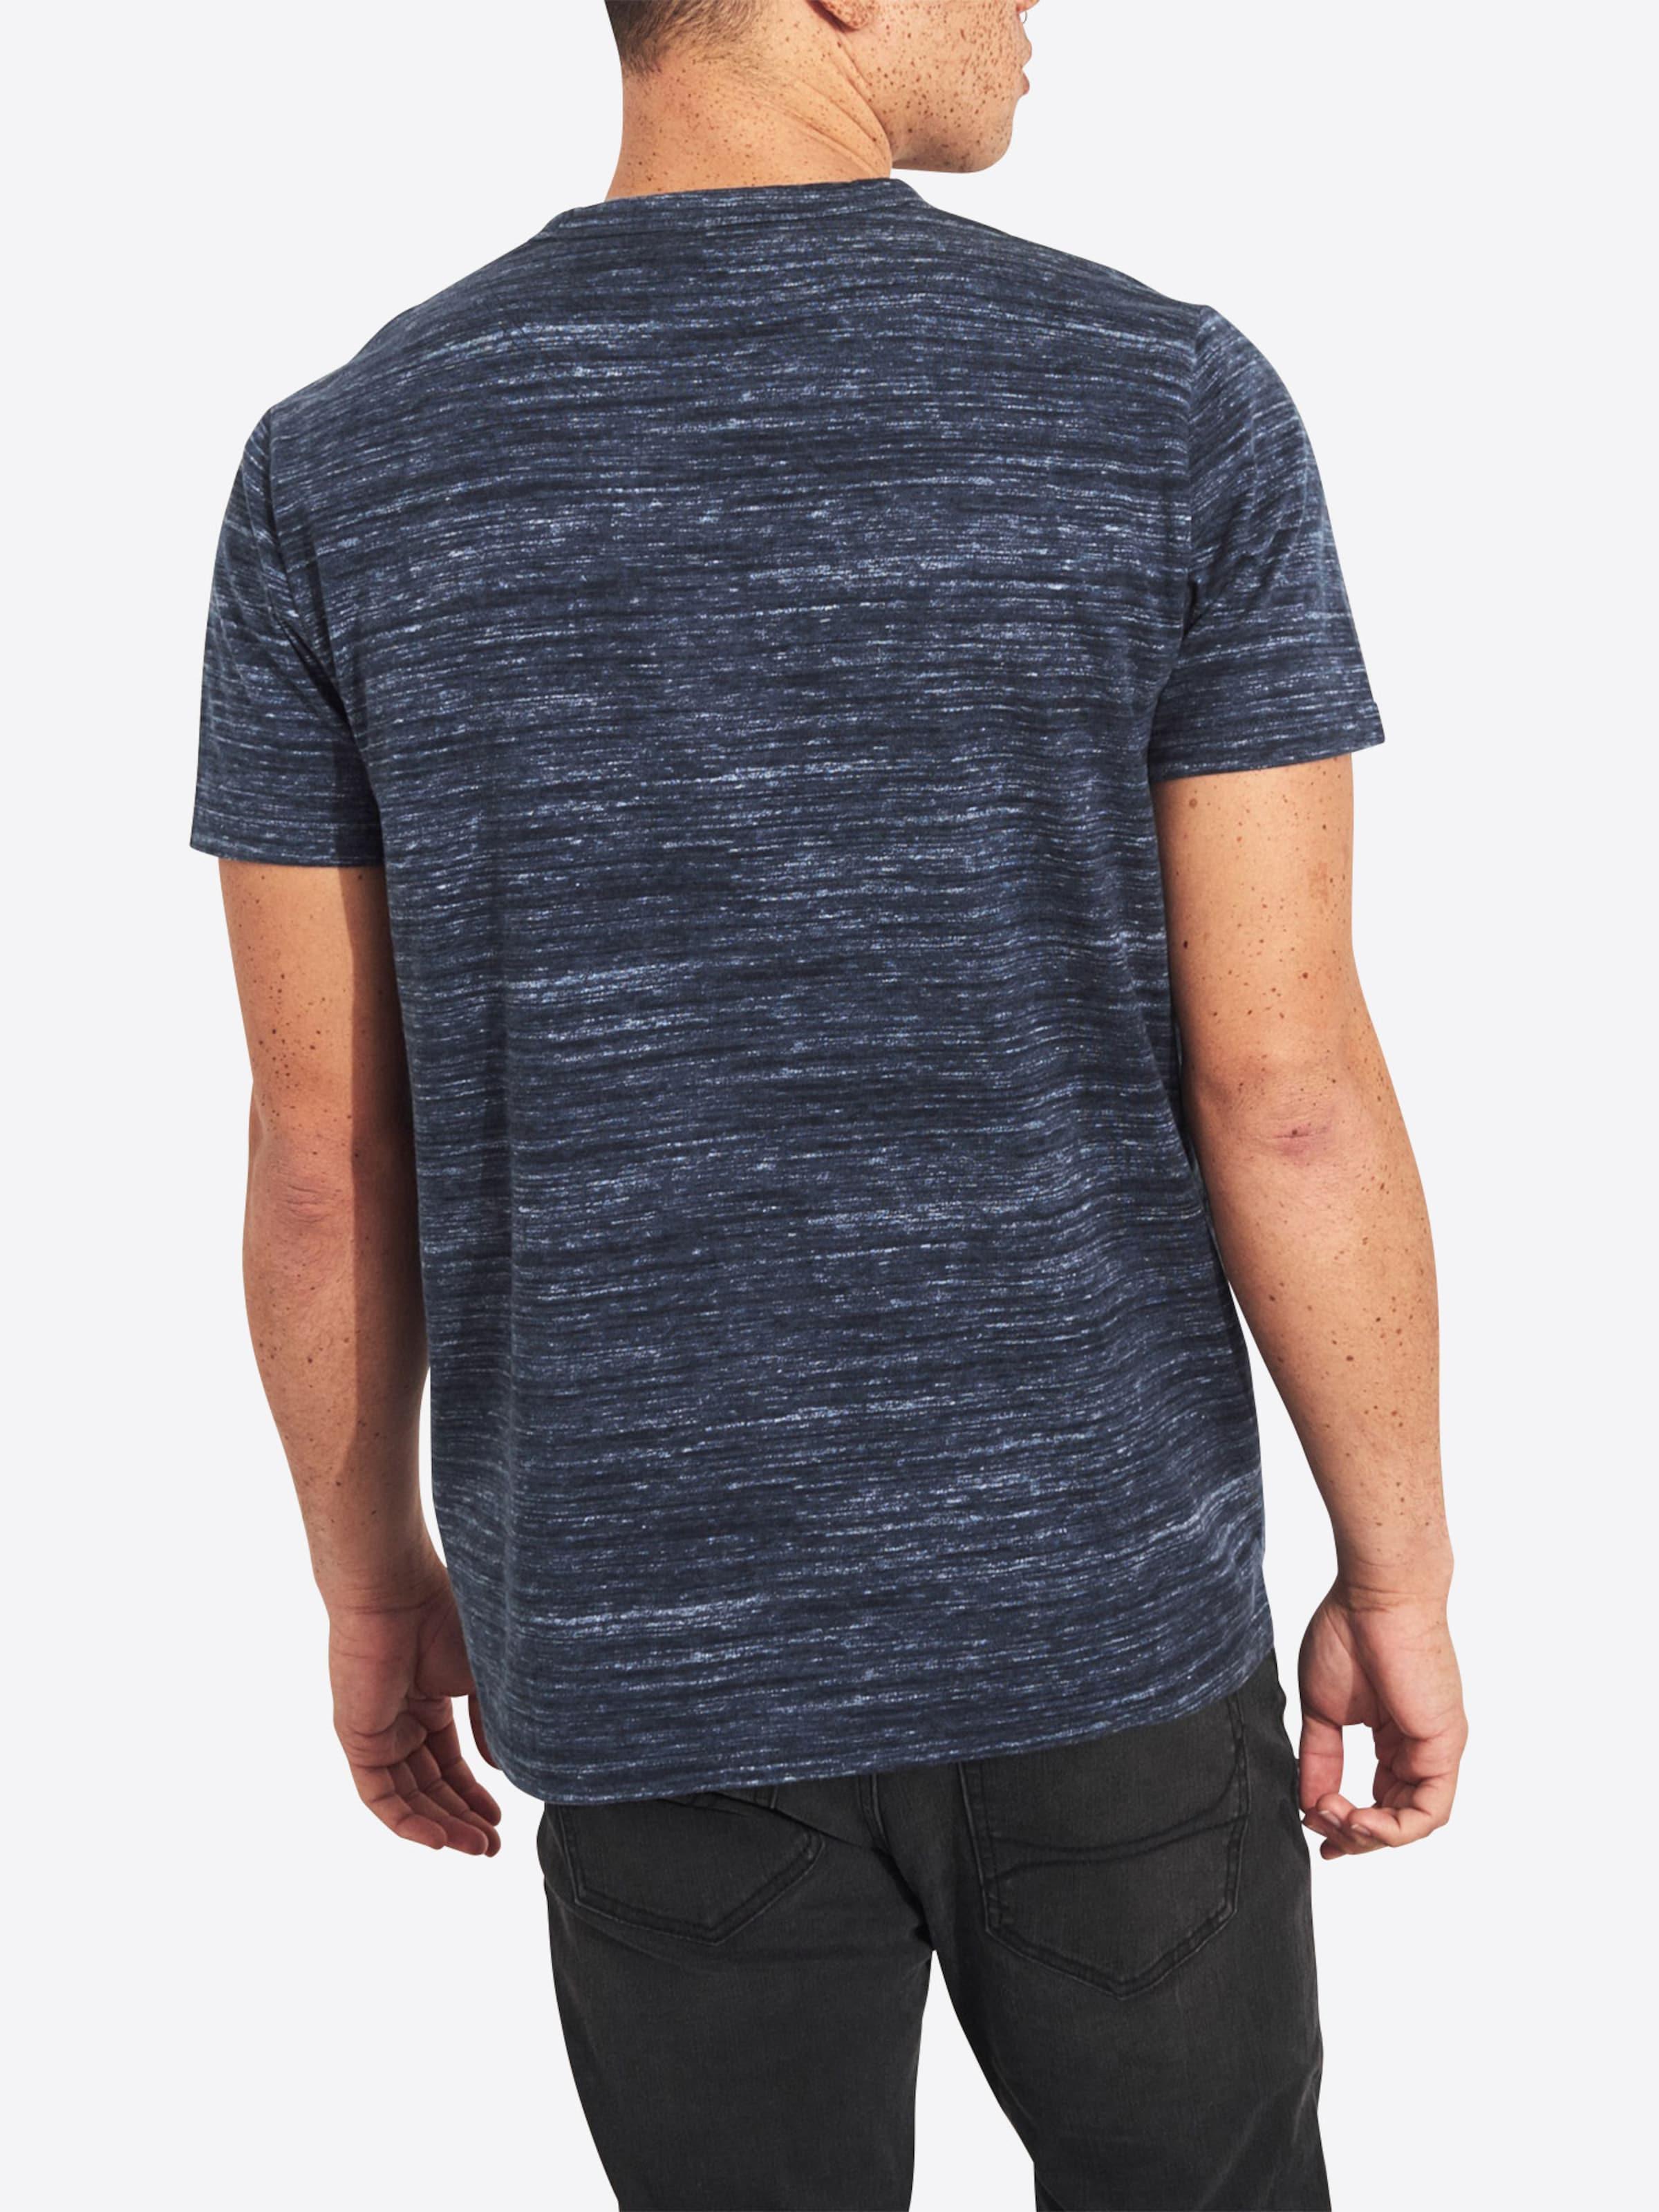 T Marine shirt En Hollister 'secondary' Bleu qSLzMVpGU